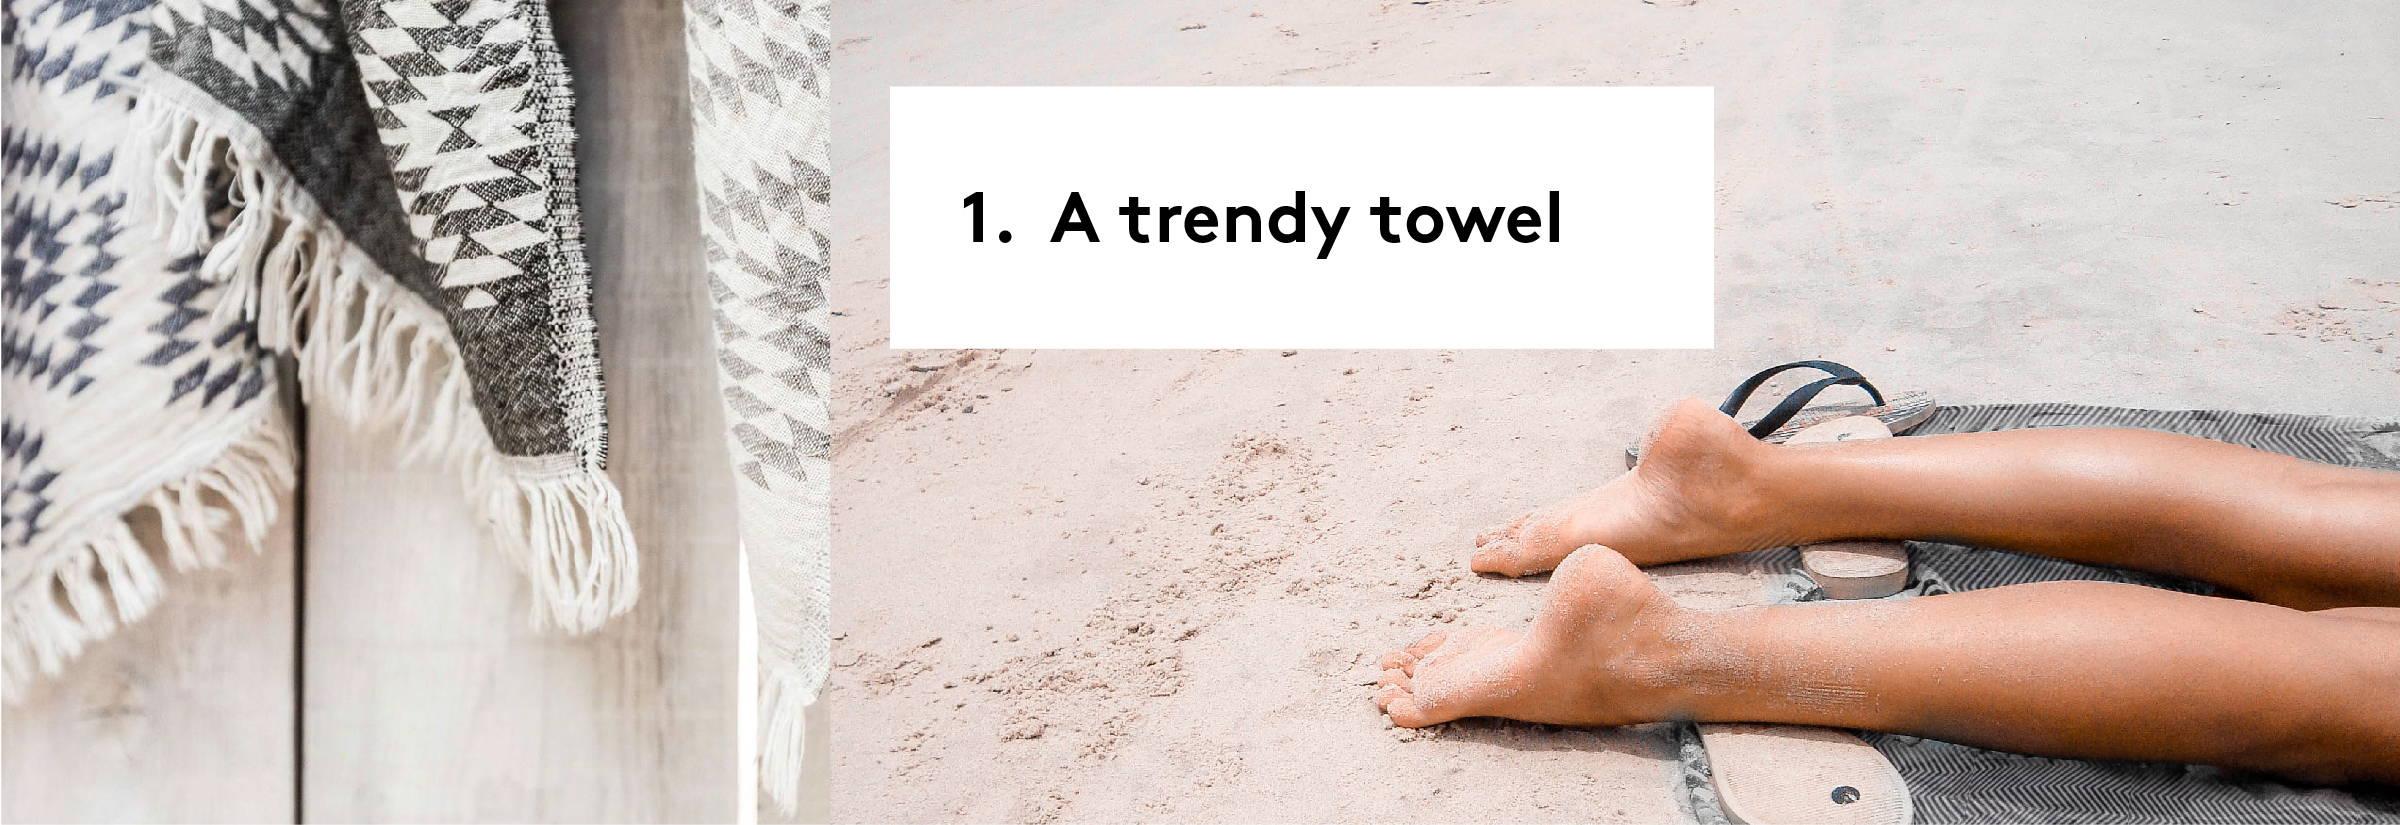 Get the TRENDY TOWEL from POKOLOKO!